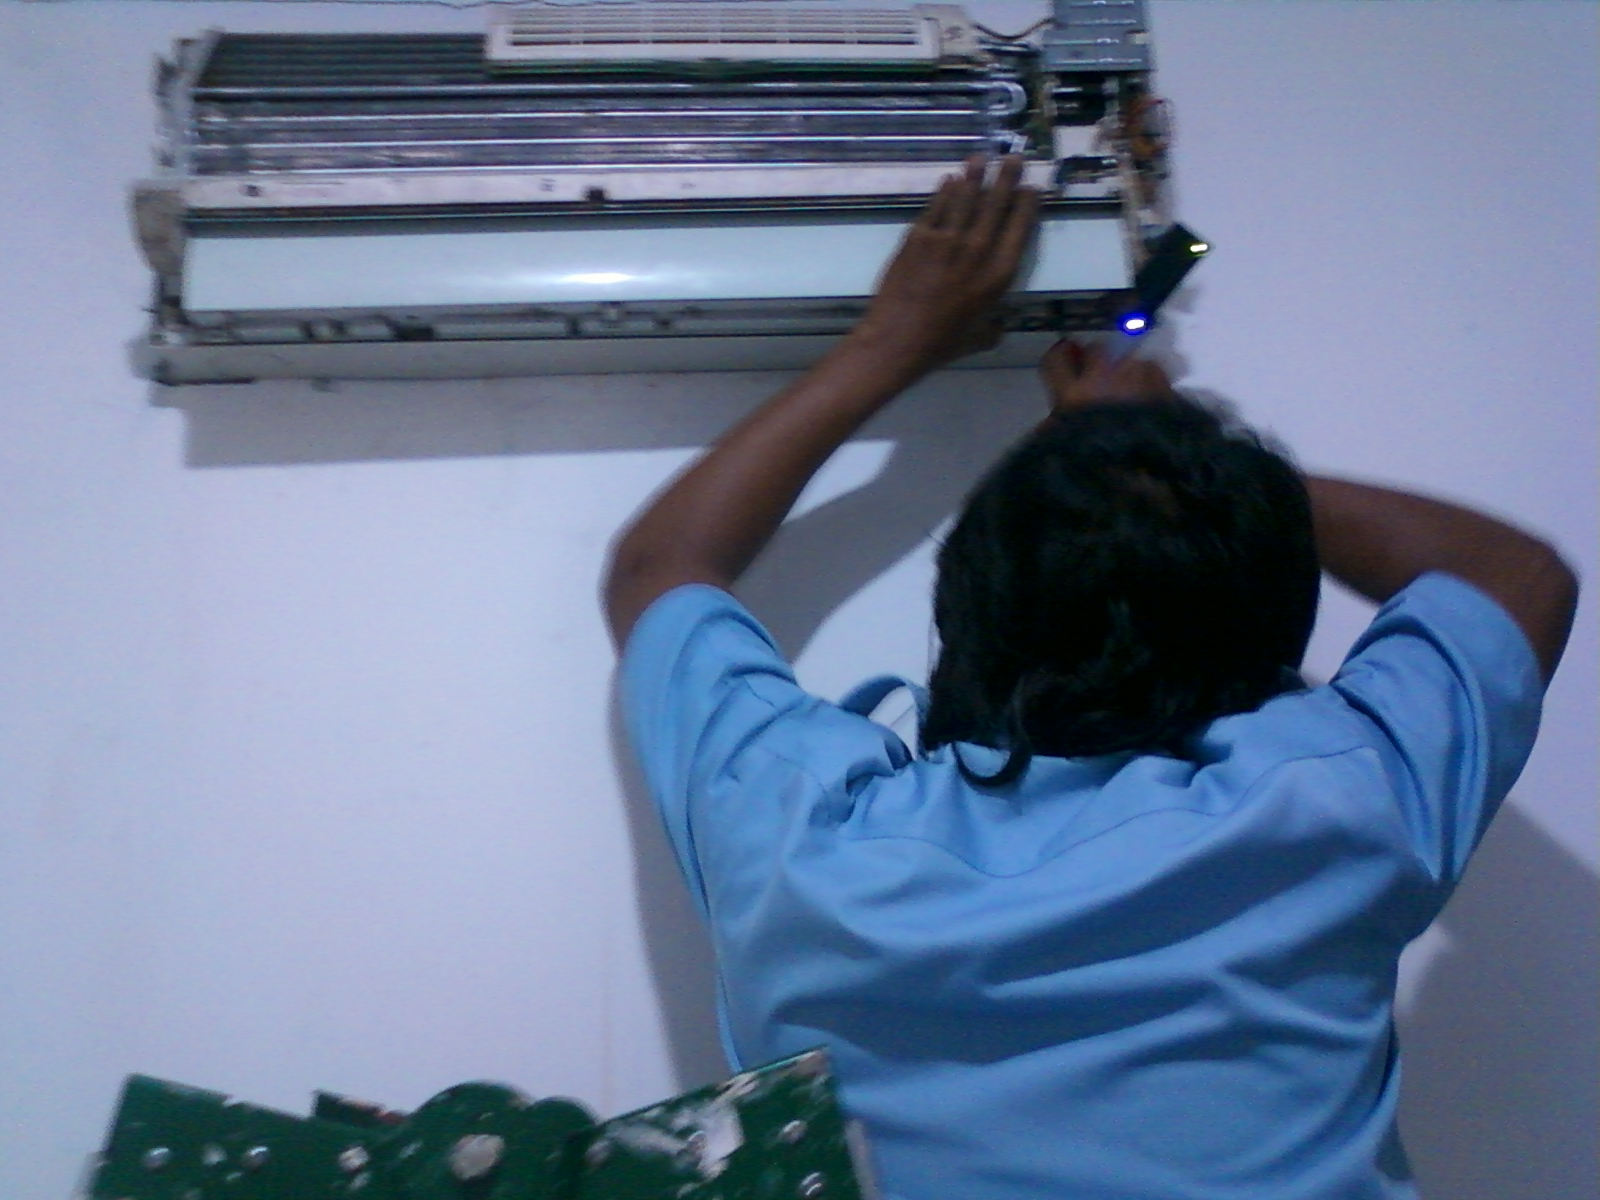 Mudahnya merawat AC di rumah anda | Service AC Jakarta - Tangerang